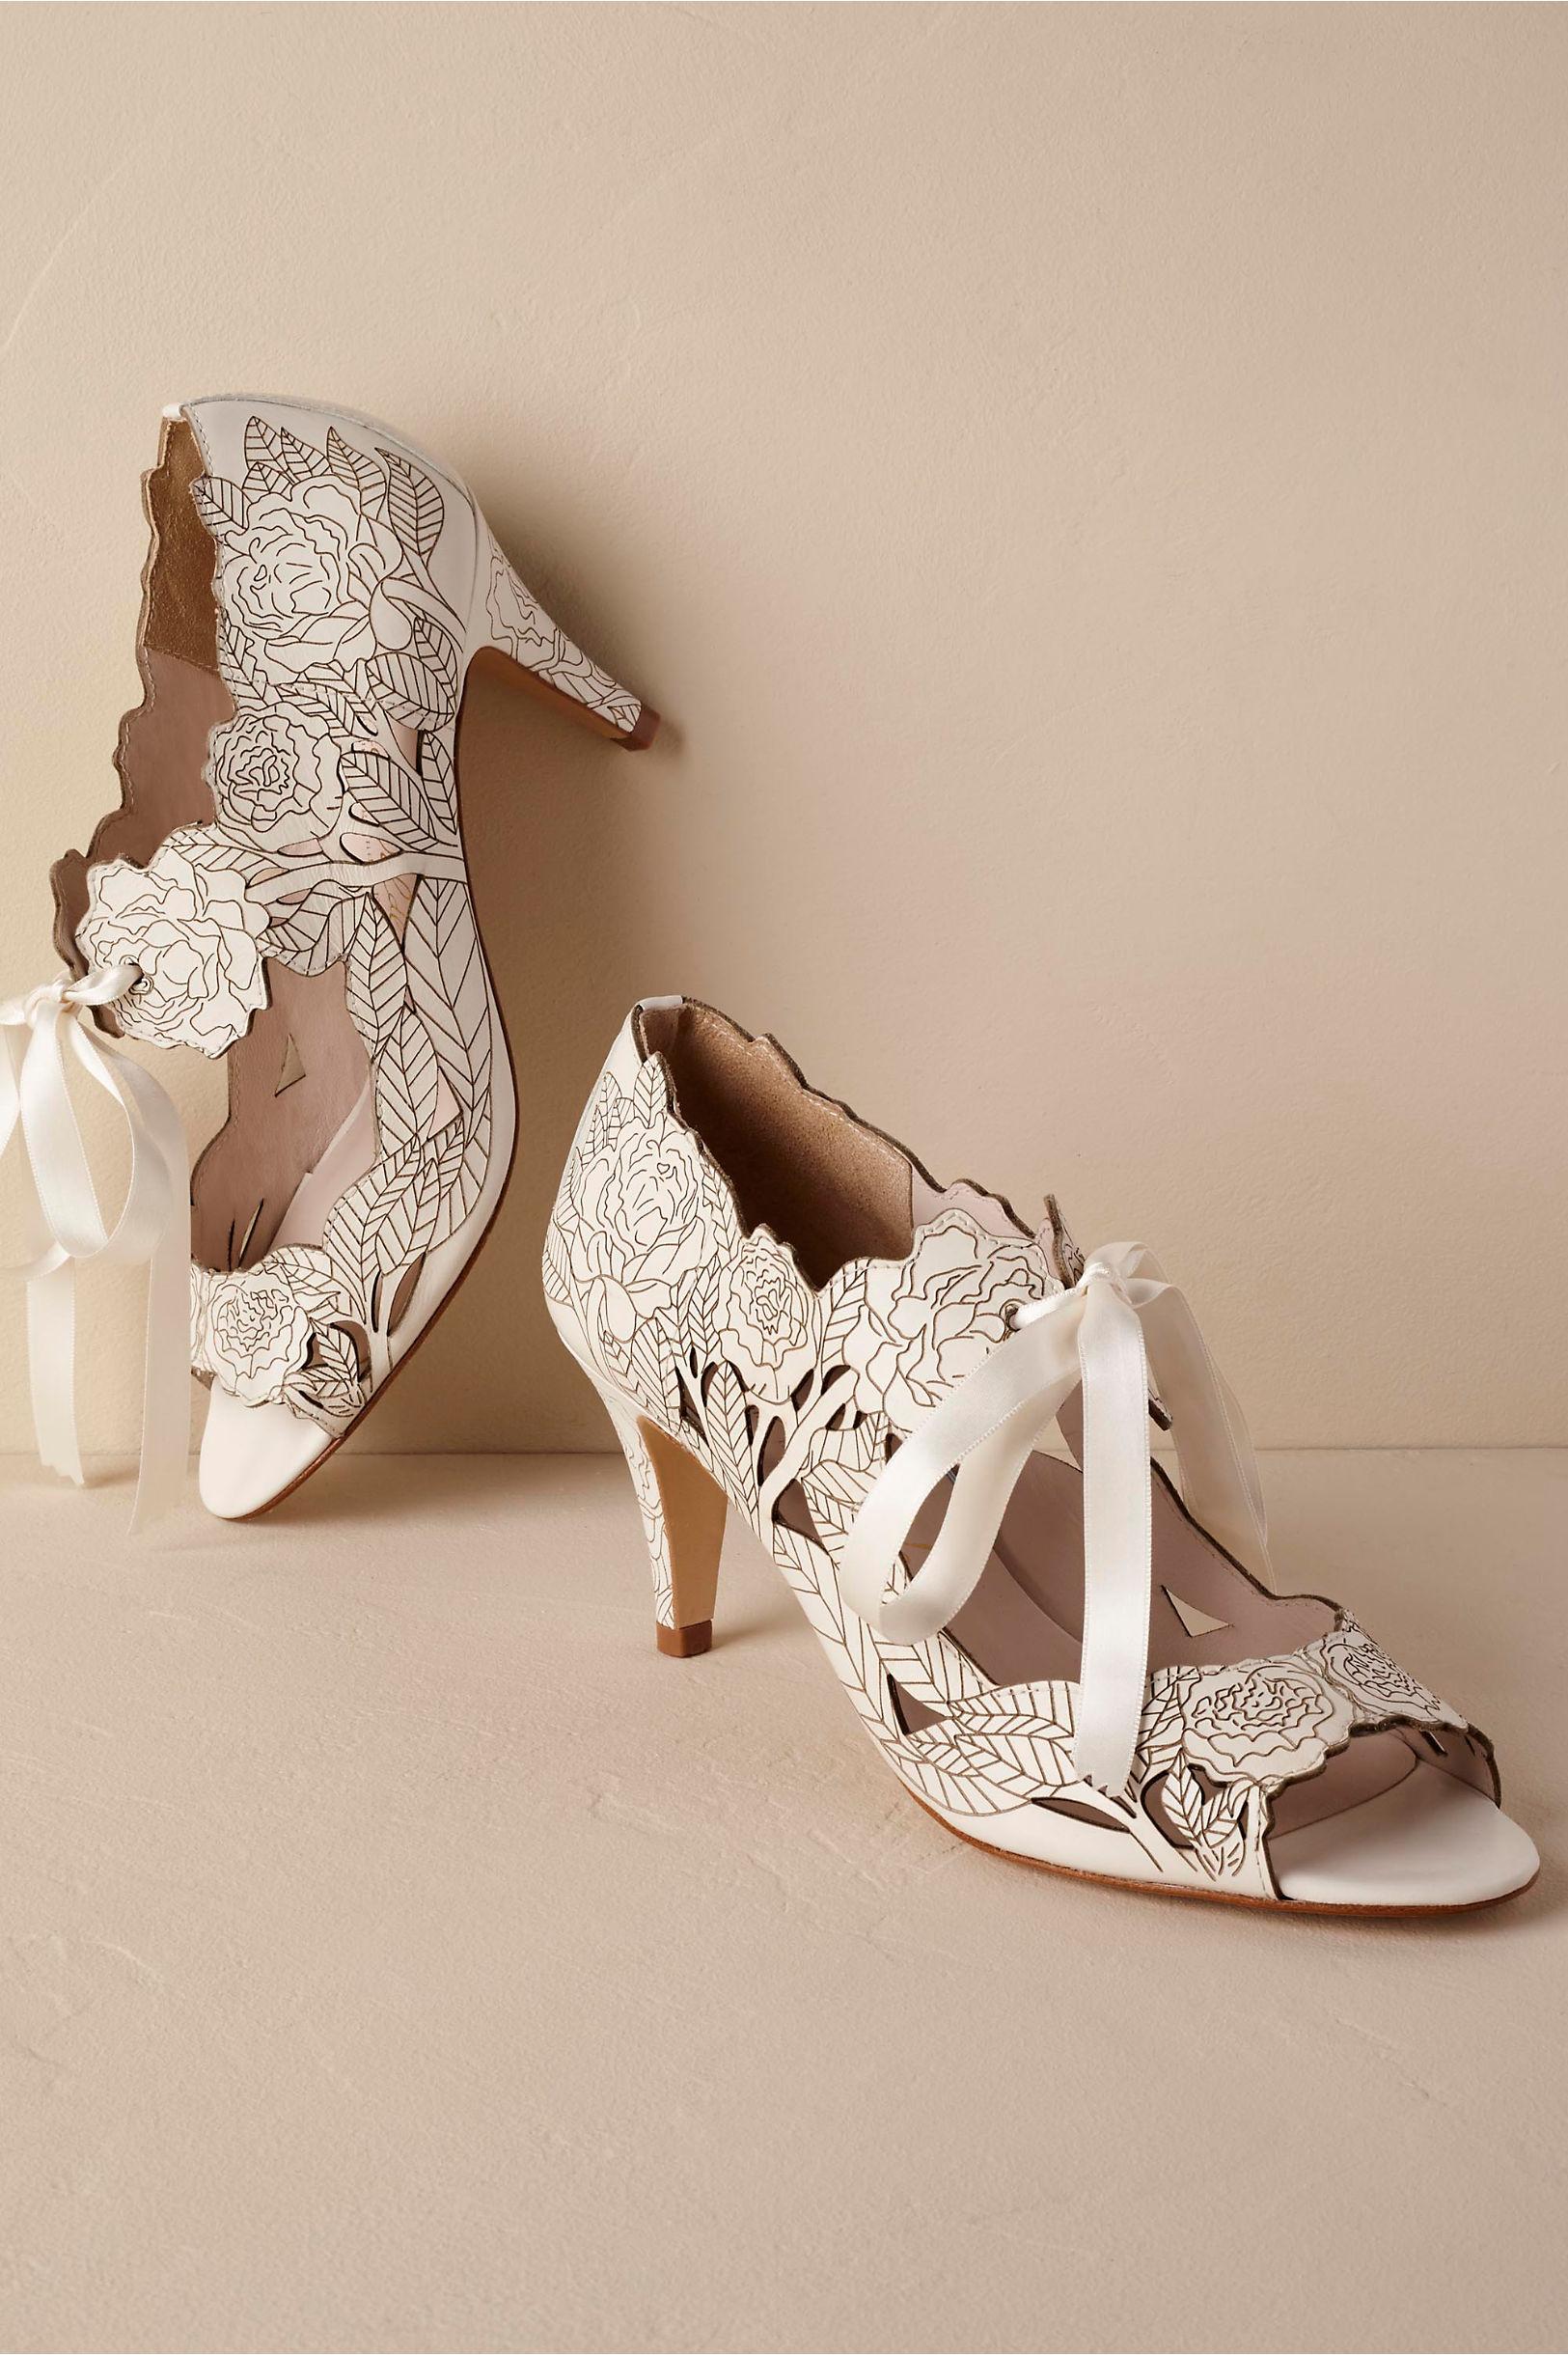 Wedding Slippers For Reception Images Decoration Ideas Heels Women Bridal Bhldn Peony